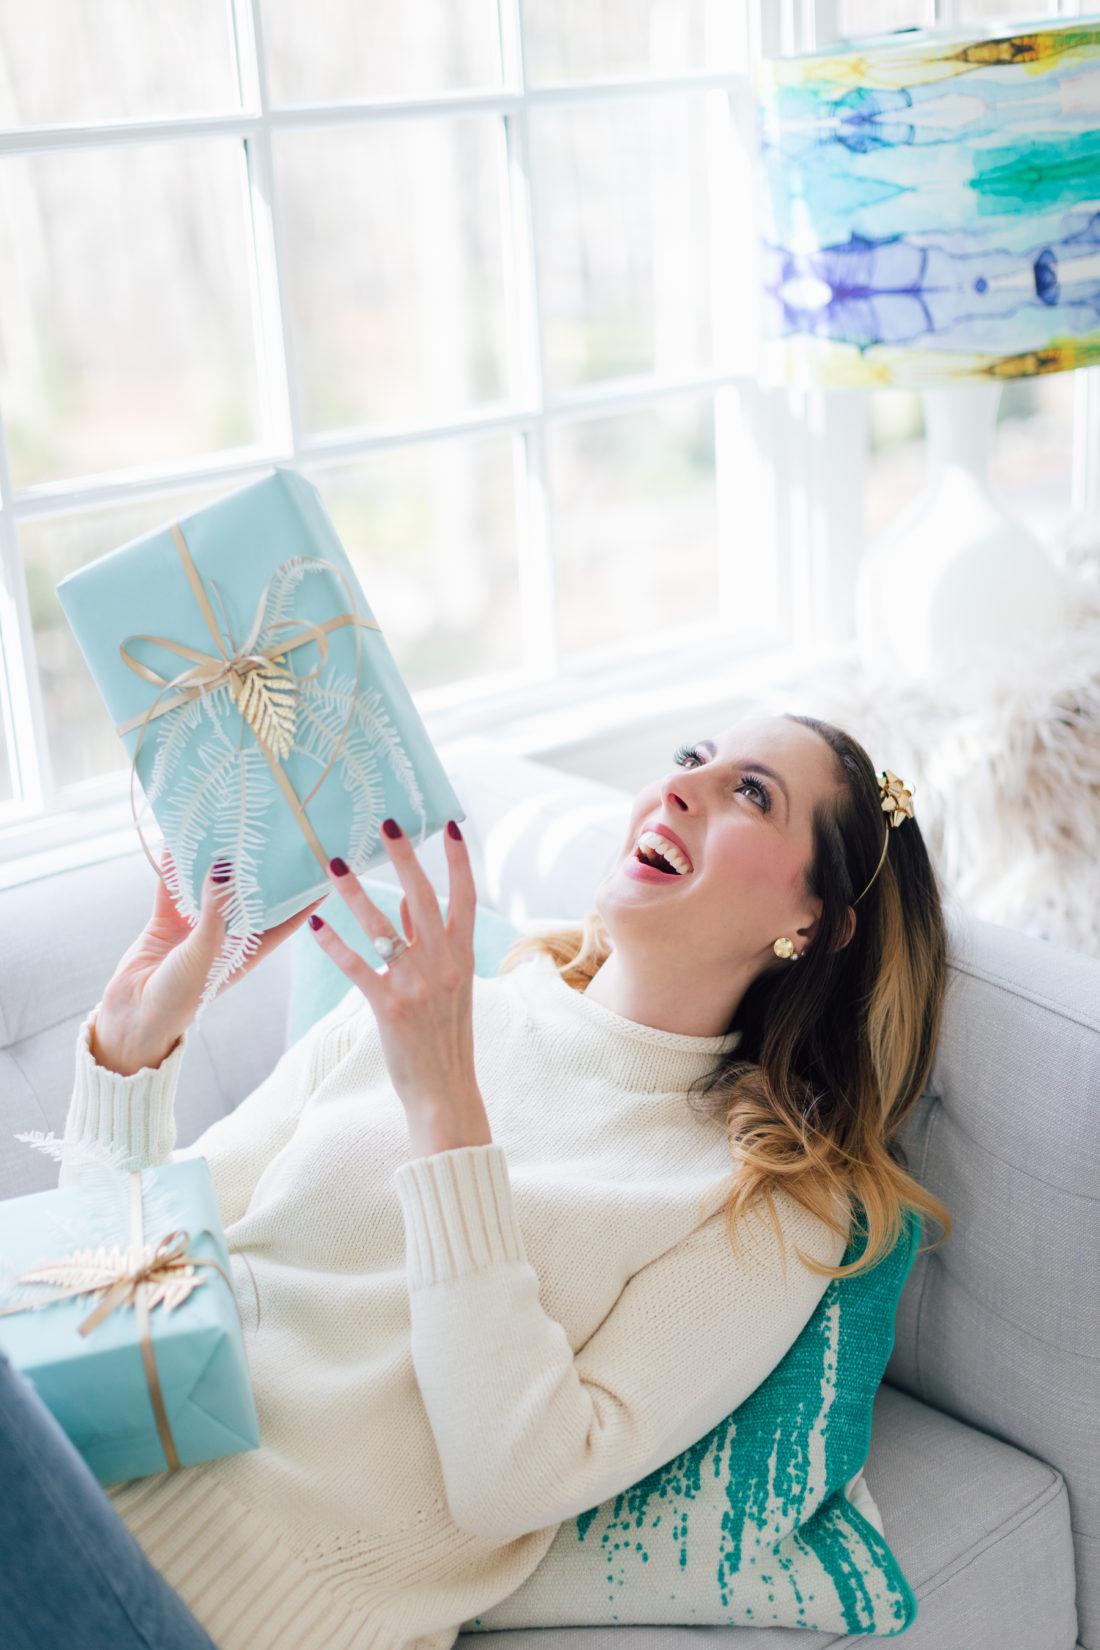 Eva Amurri Martino shares her Holiday Gift Guides for 2018!